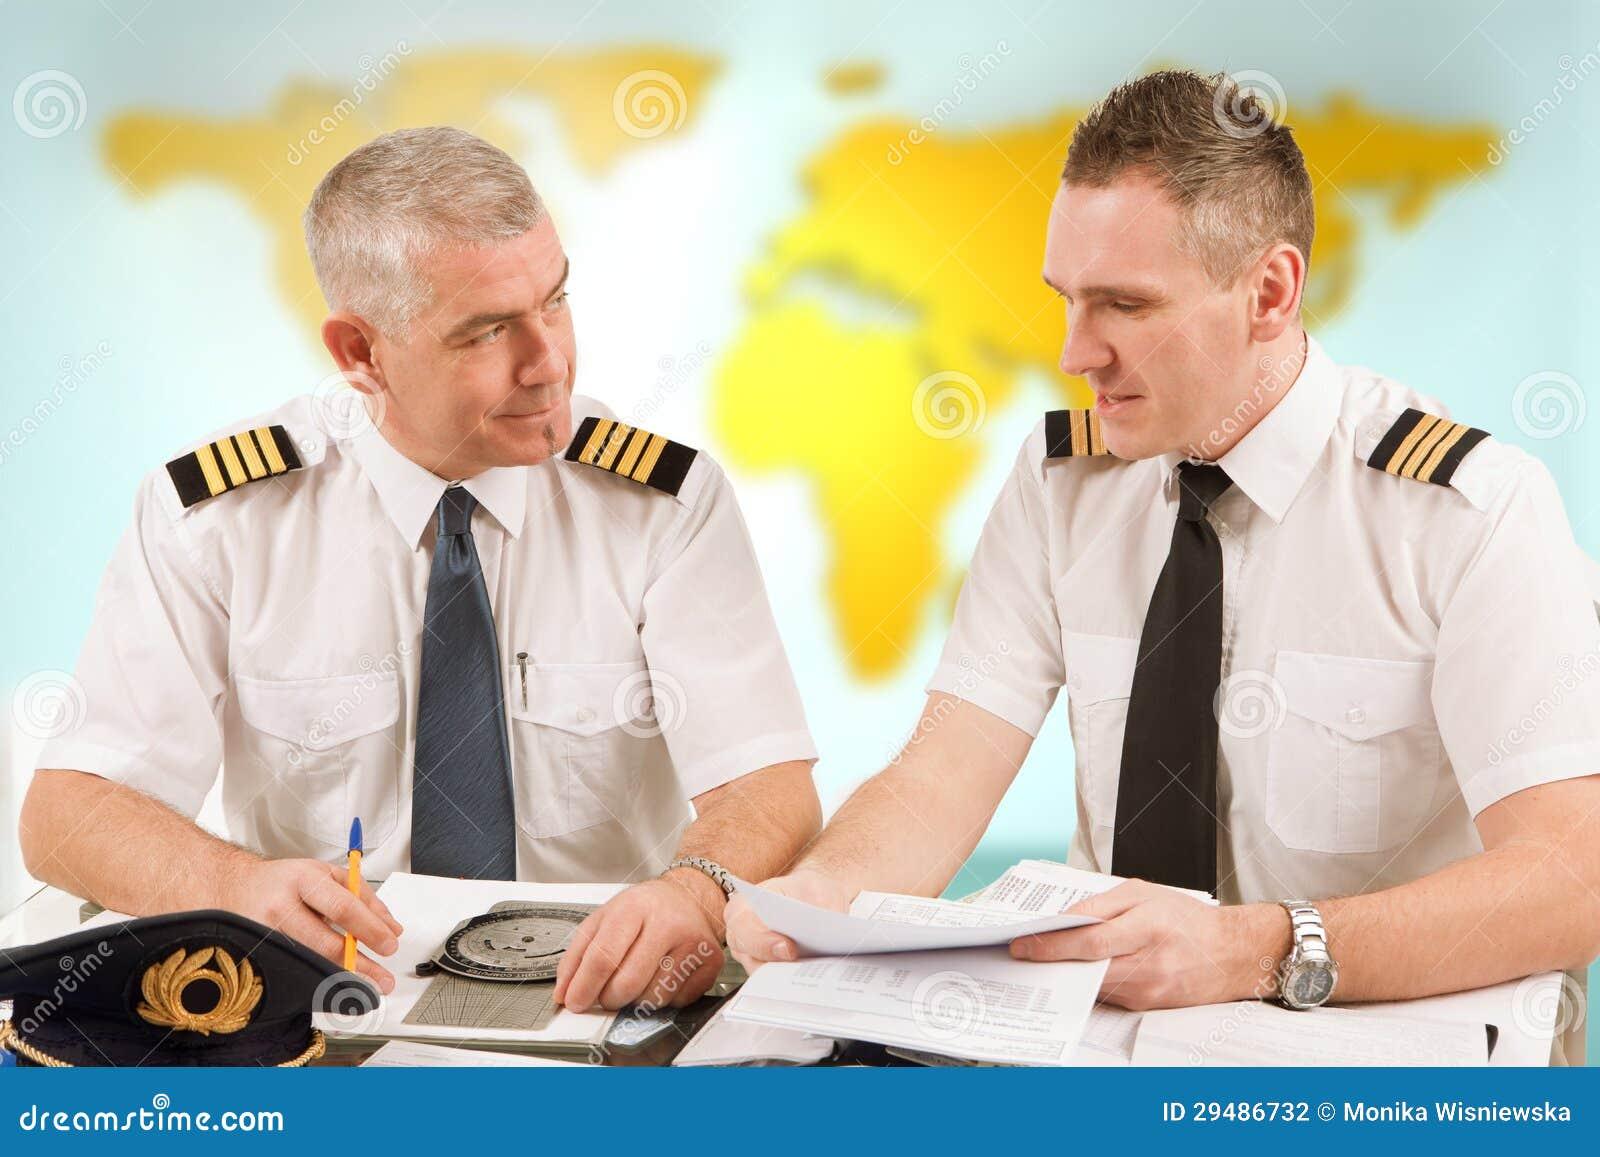 Farting Passenger Forces Plane To Make Emergency Landing